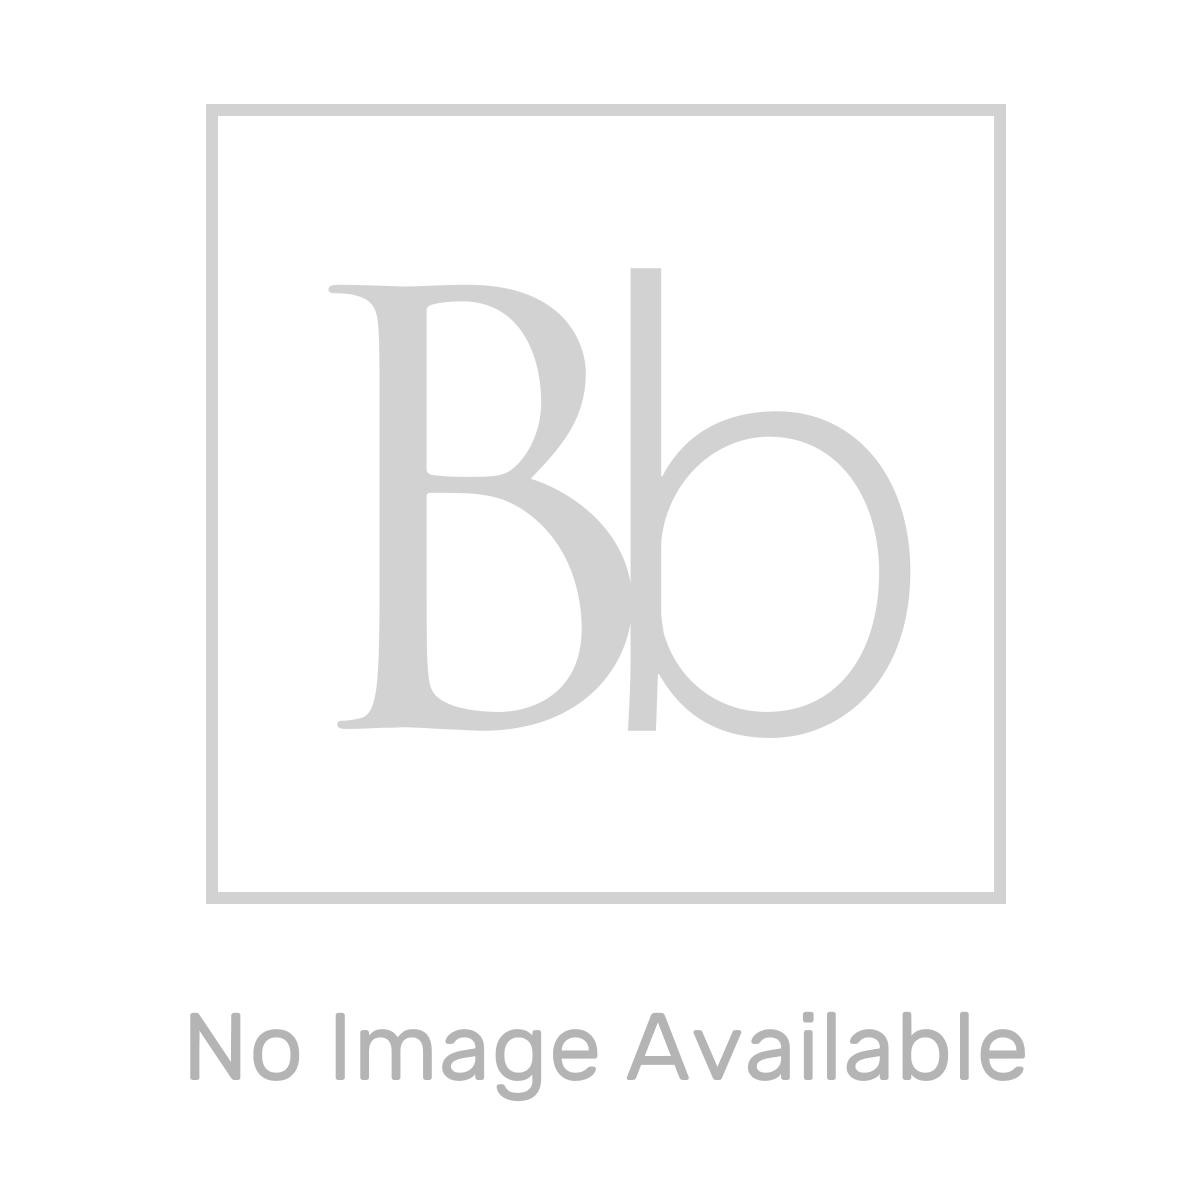 Merlyn Series 8 Hinged Shower Door with Inline Panel